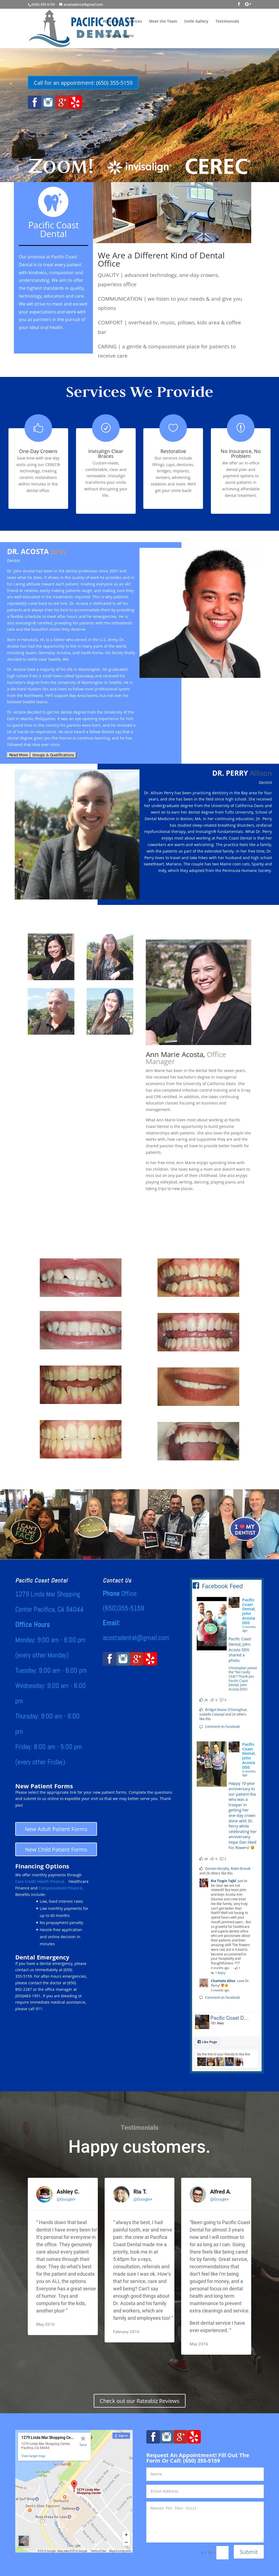 Pacific Coast Dental, John Acosta Dds Competitors, Revenue